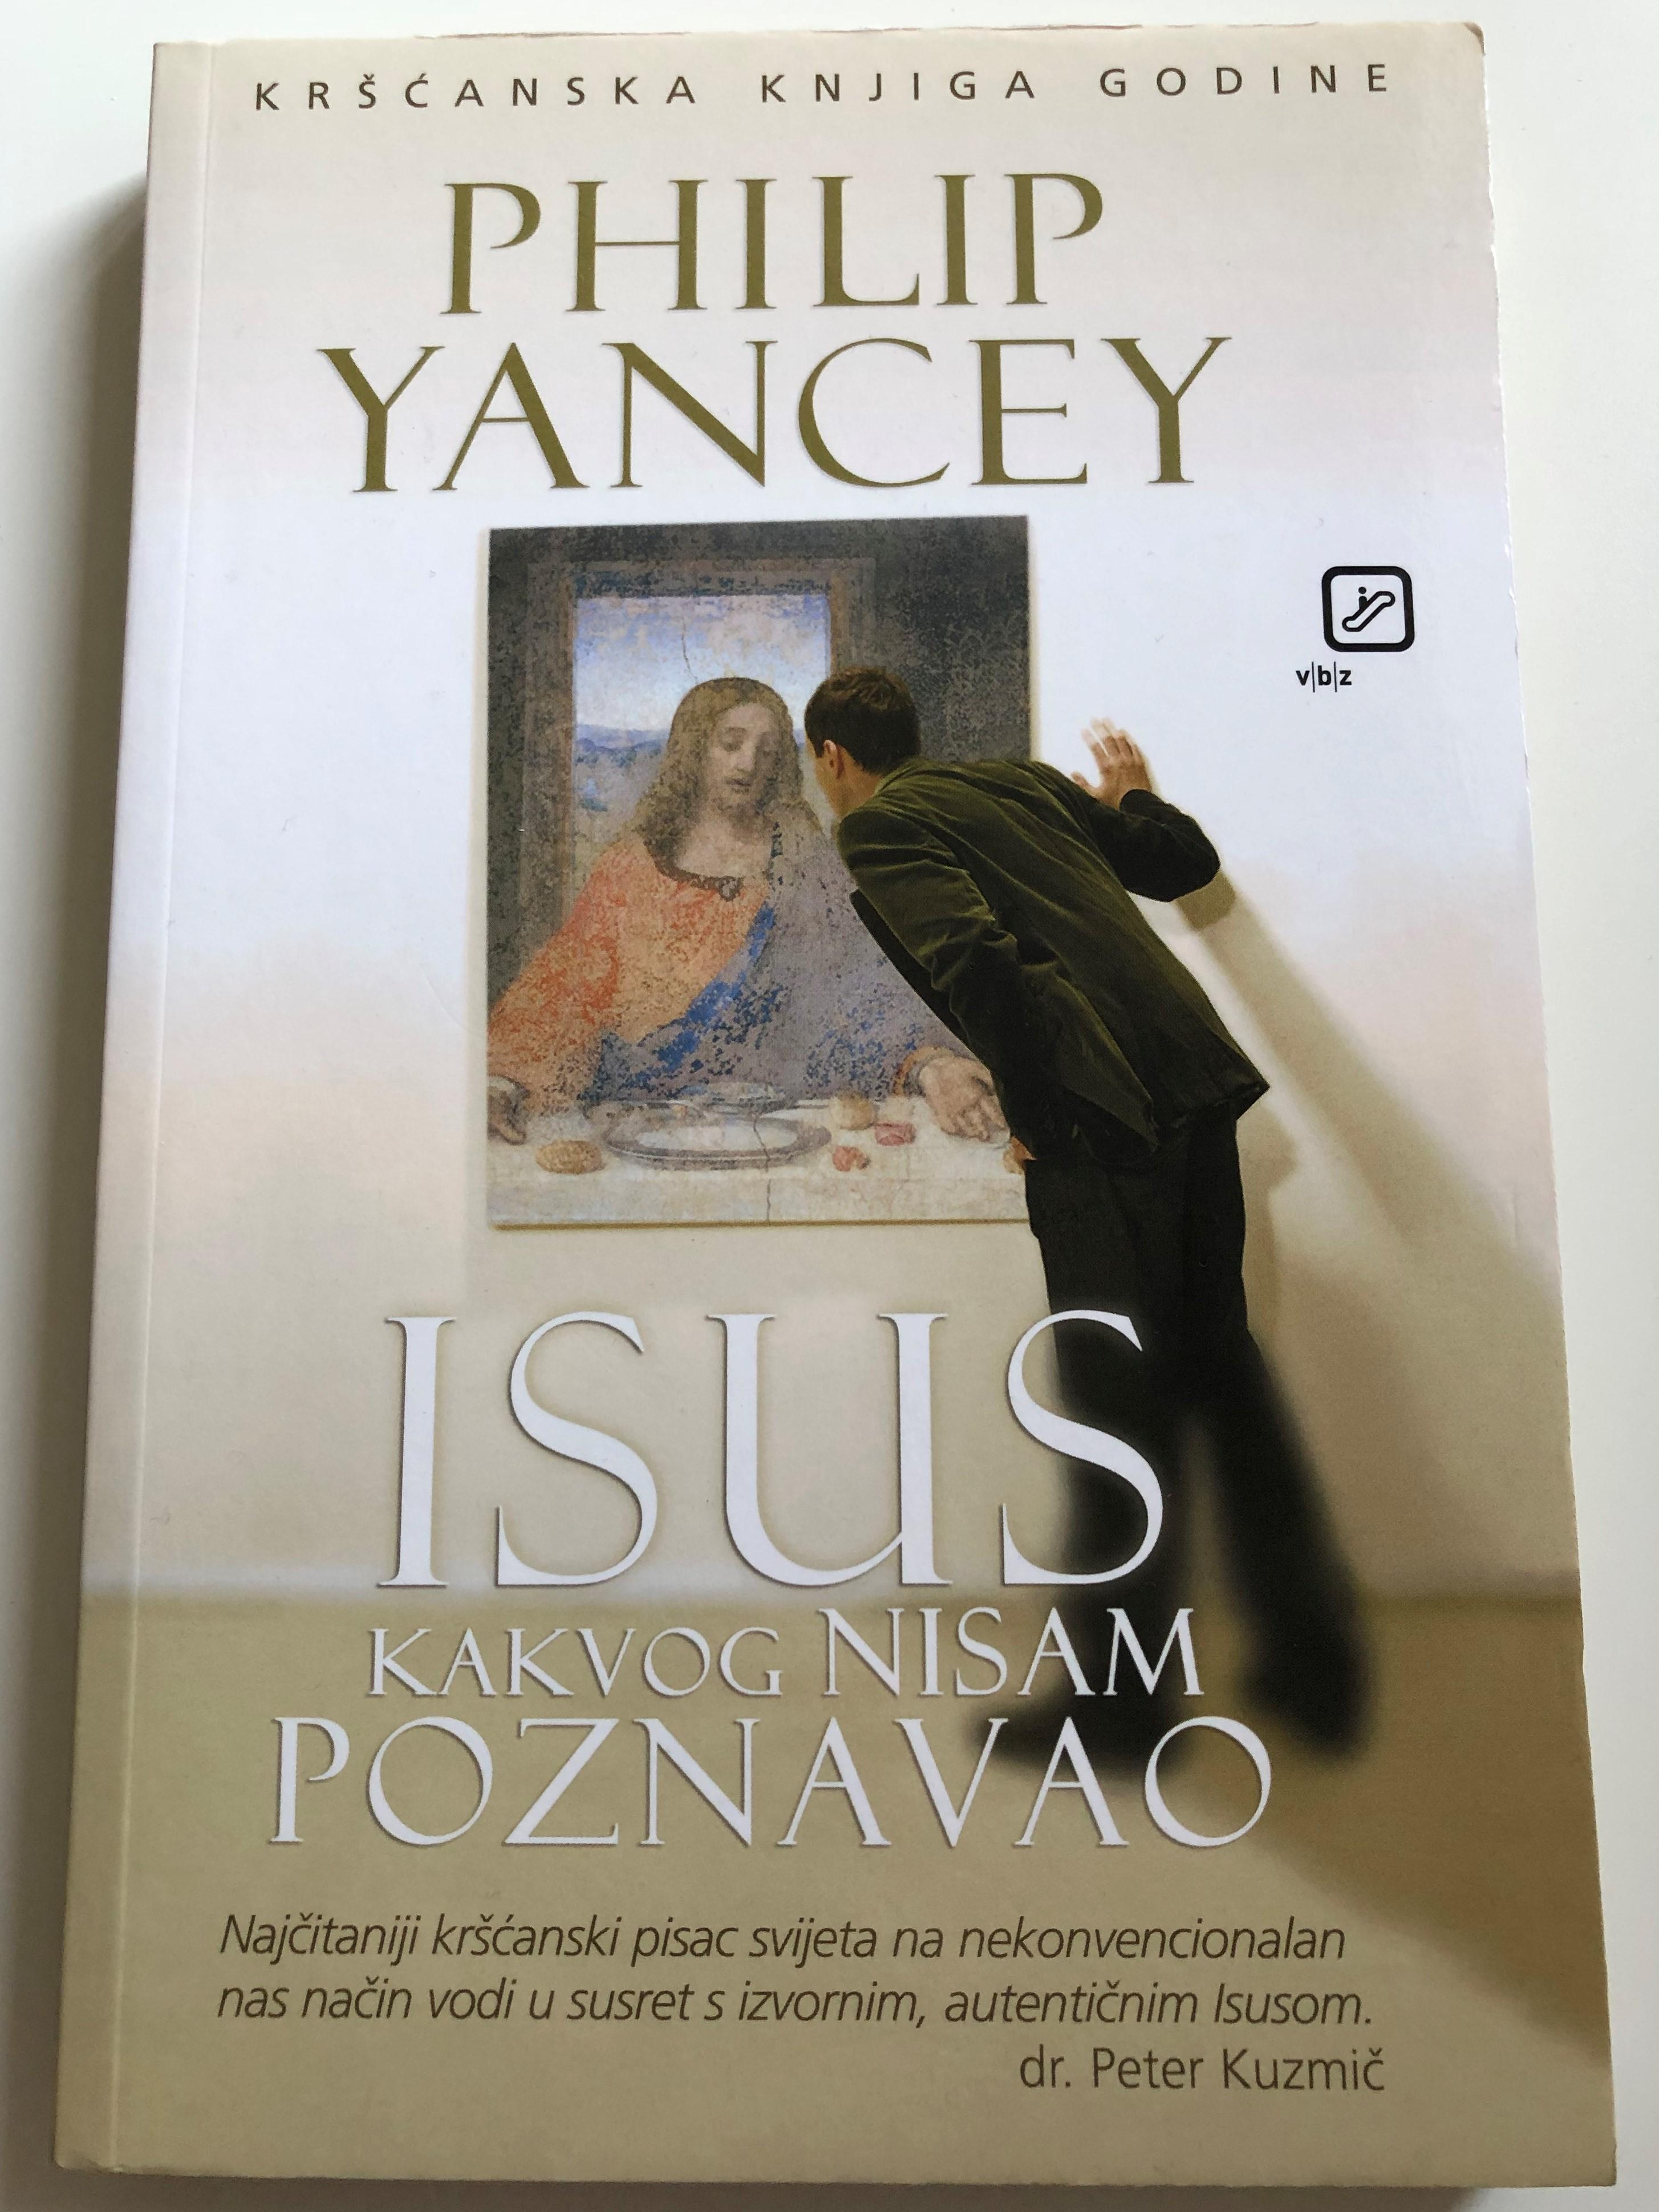 isus-kakvog-nisam-poznavao-by-philip-yancey-croatian-language-edition-1.jpg